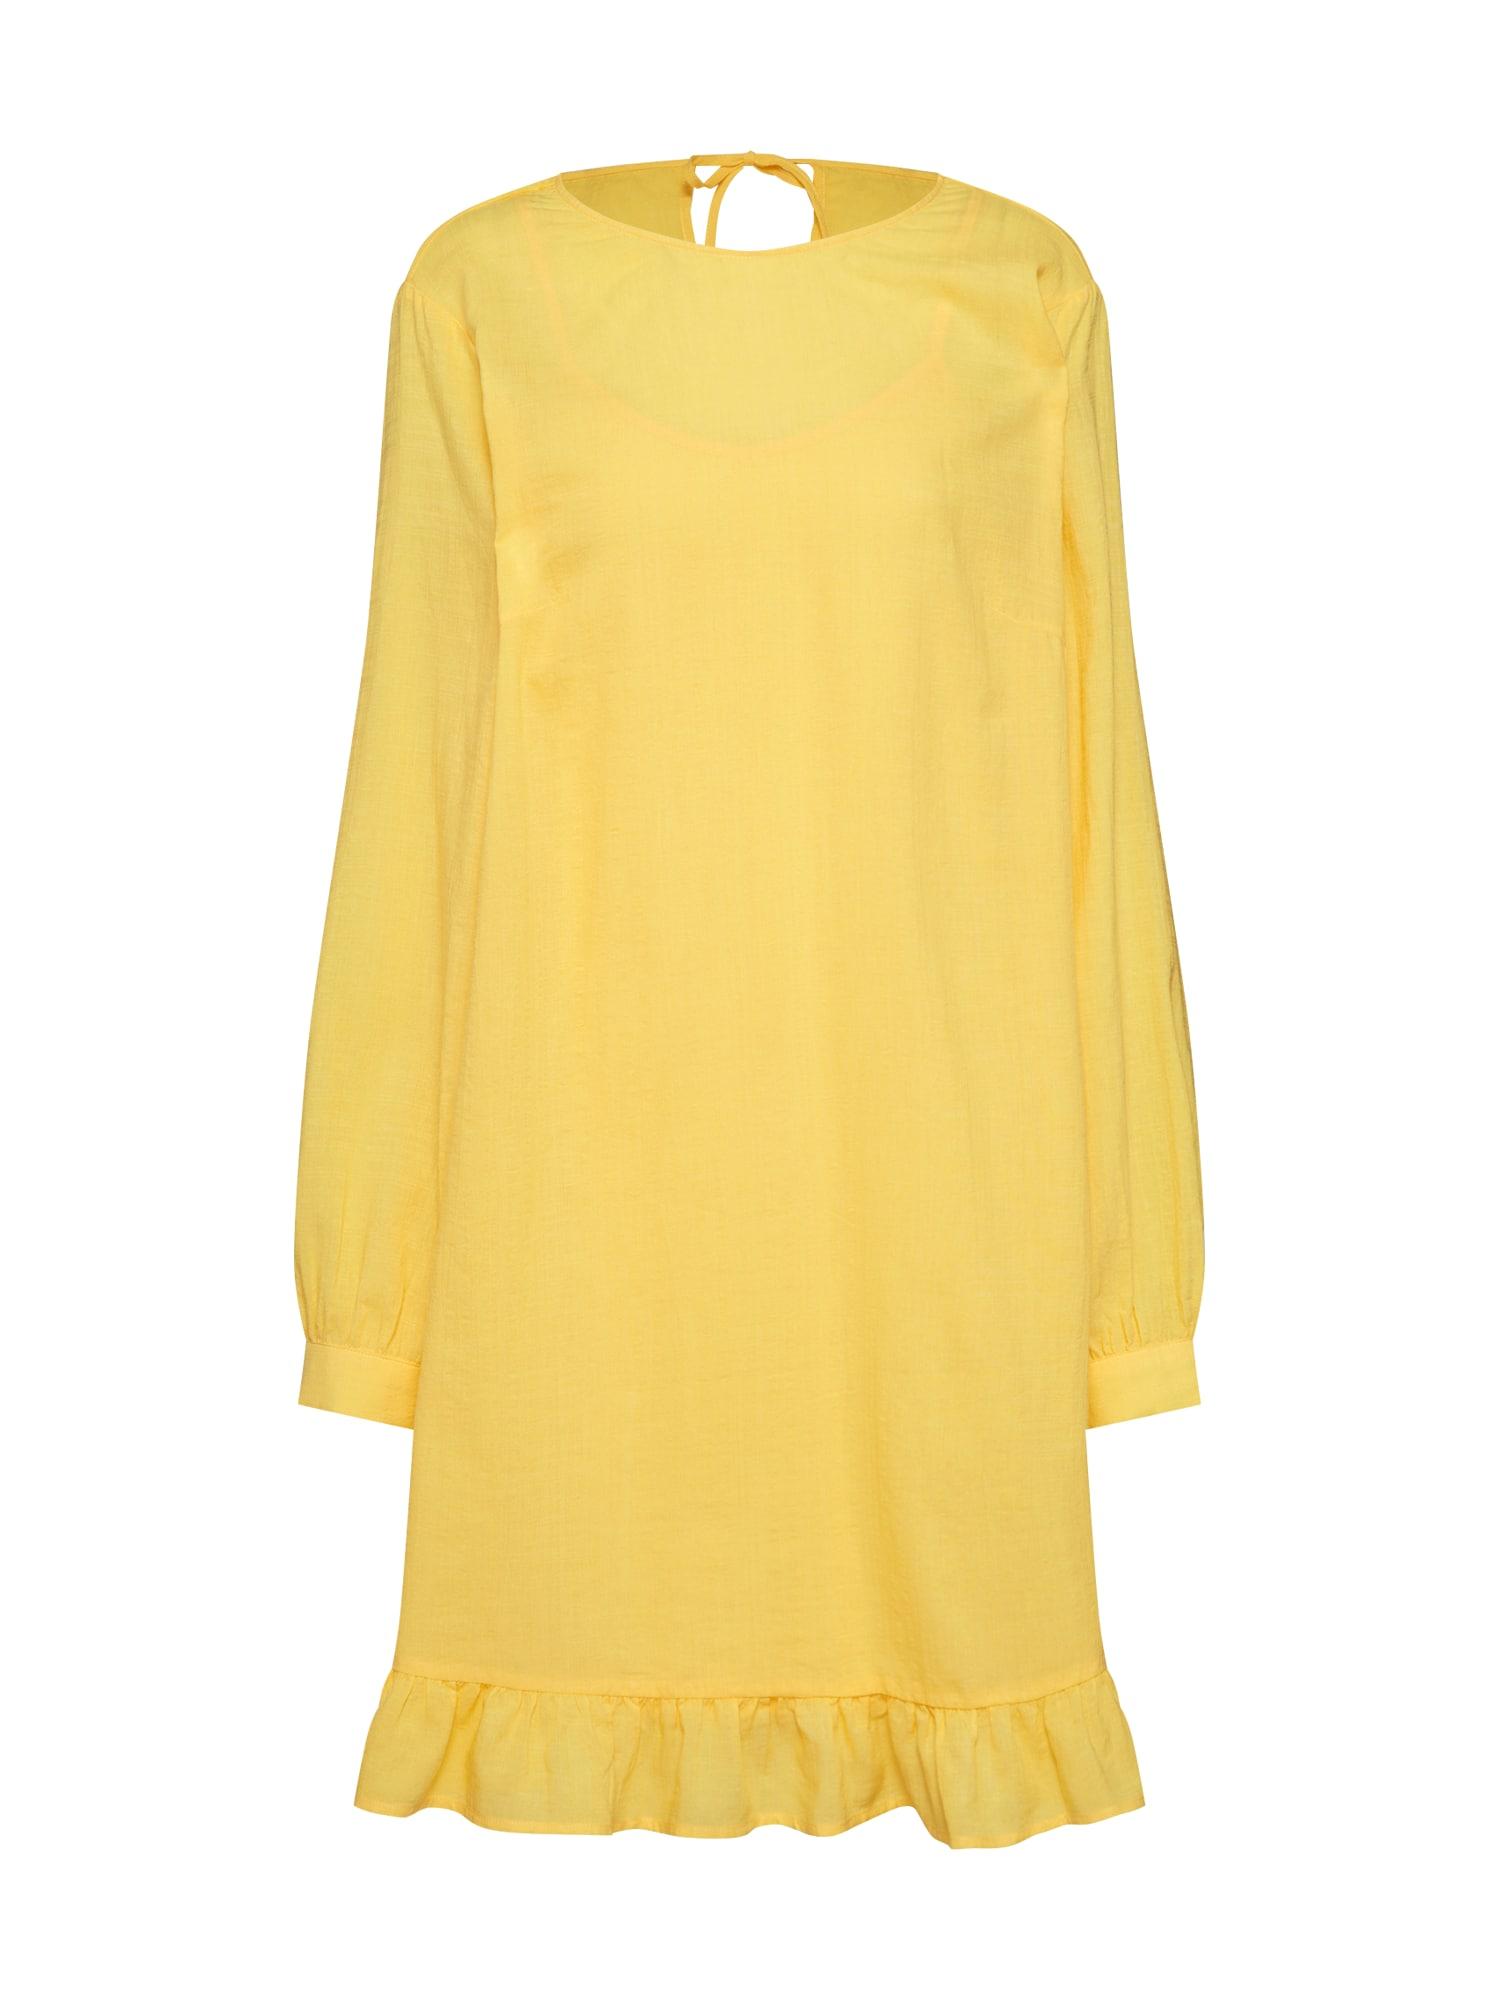 Letní šaty Sarah žlutá MOSS COPENHAGEN